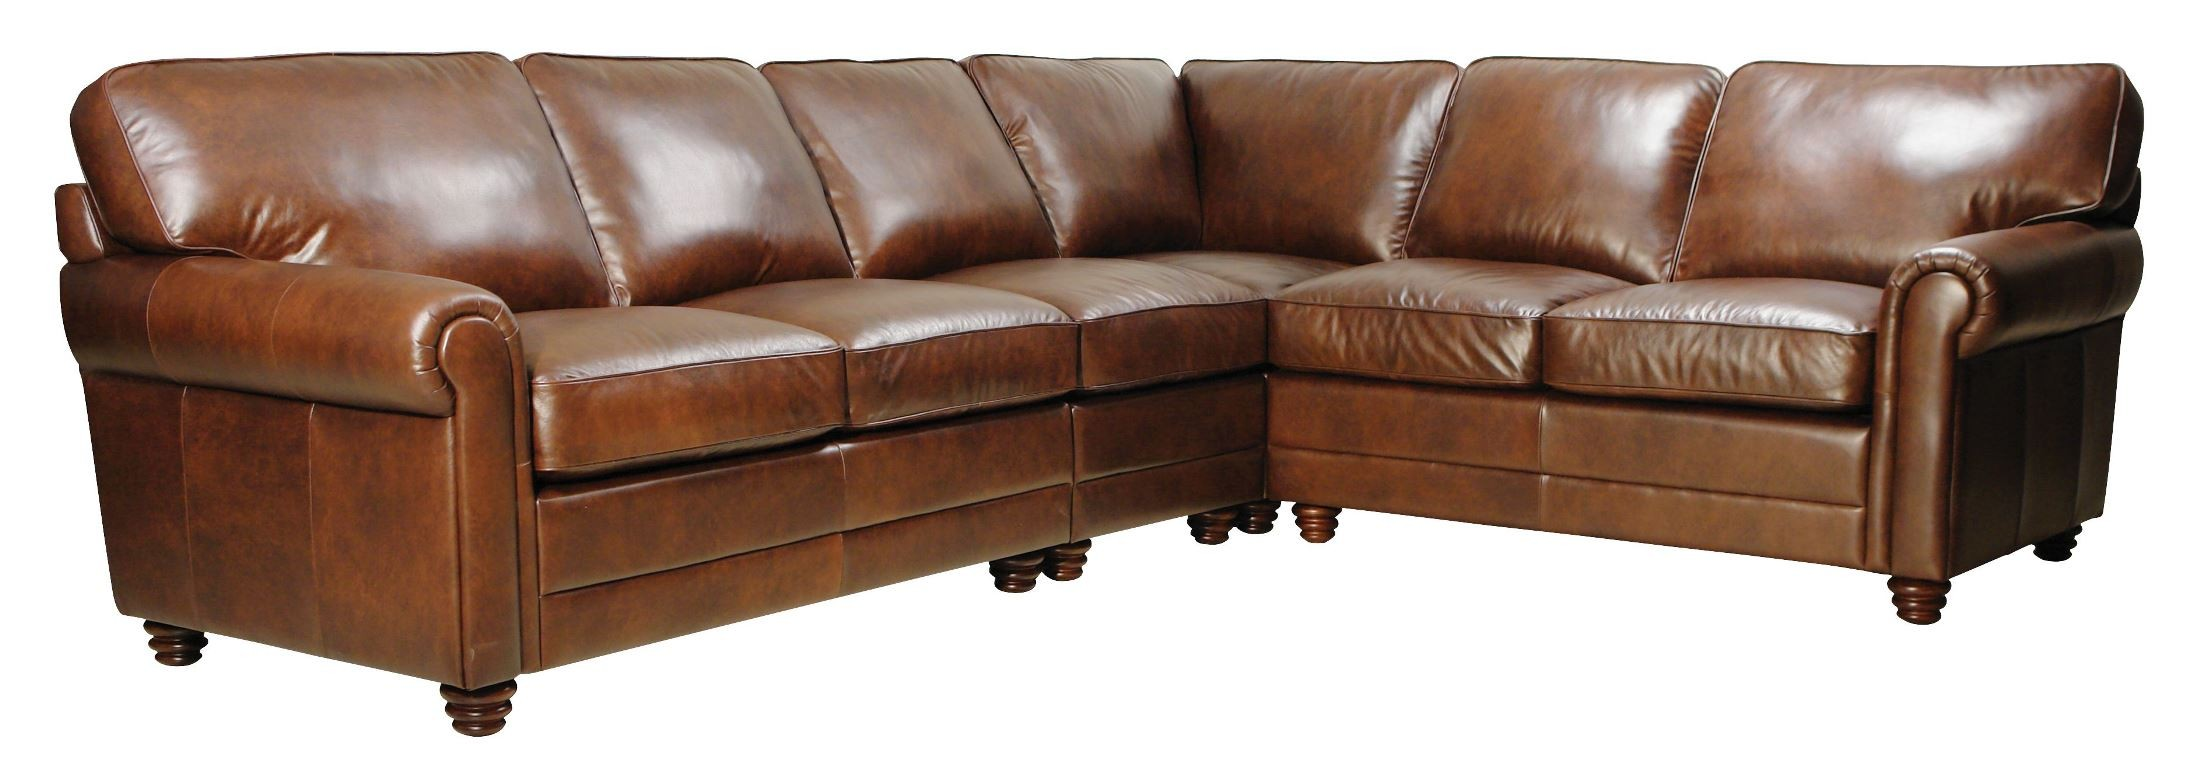 Andrew havana finish 4 piece italian leather sectional for 8 piece leather sectional sofa